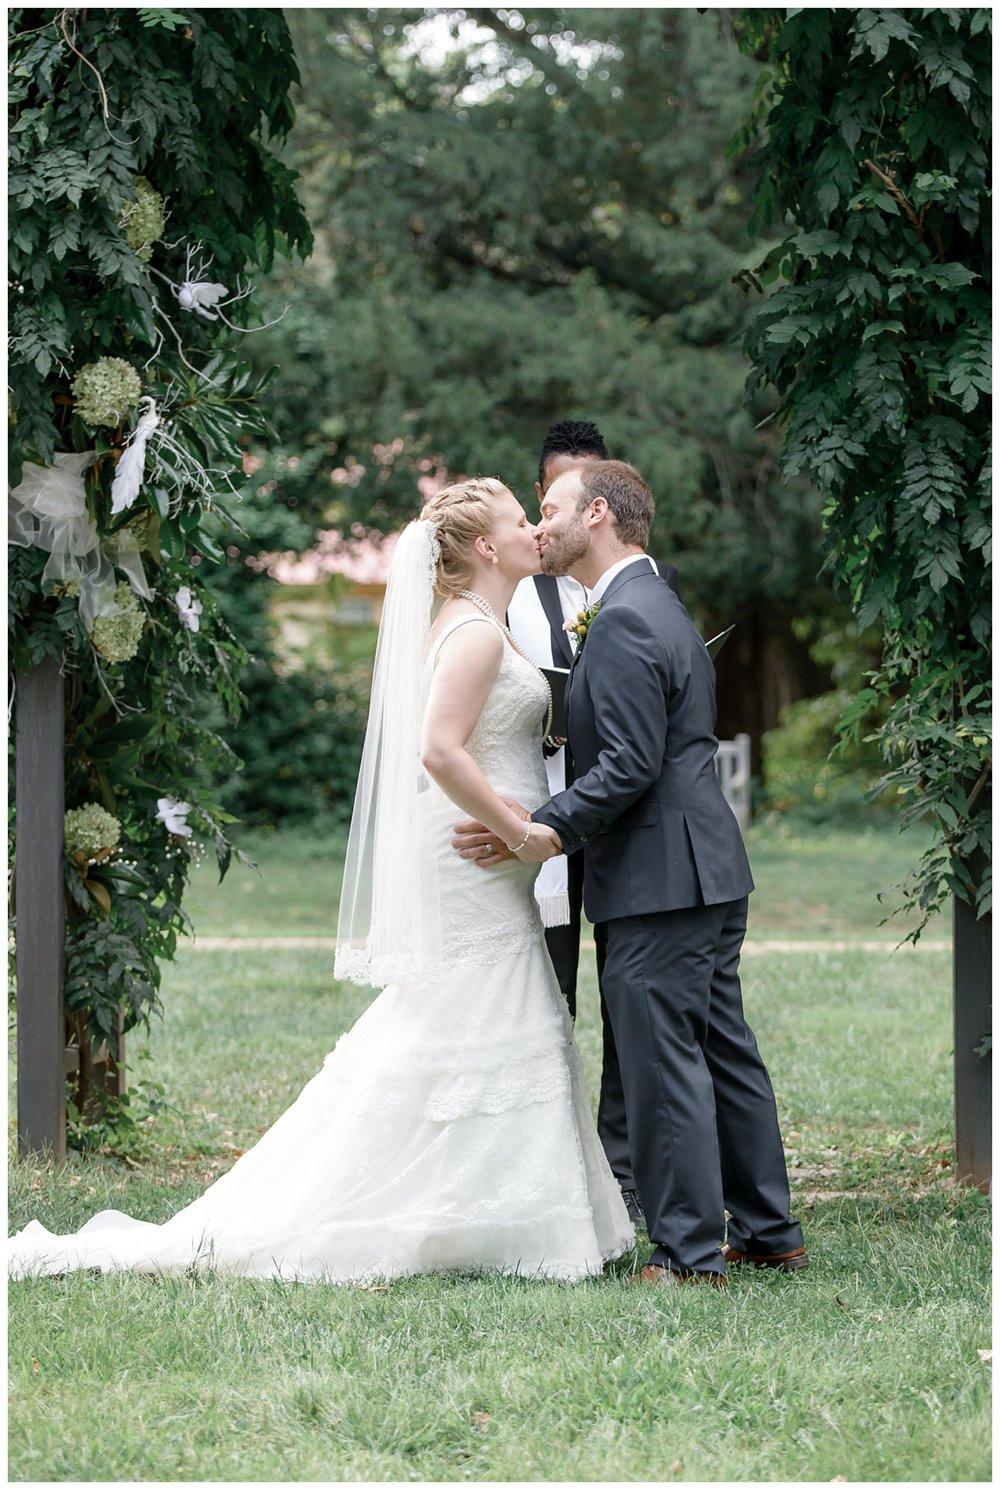 Della and Andrew Wedding Photos_Hendry House Arlington Virginia_Stephanie Kopf Photography_Northern Virginia Wedding Photography-146.jpg